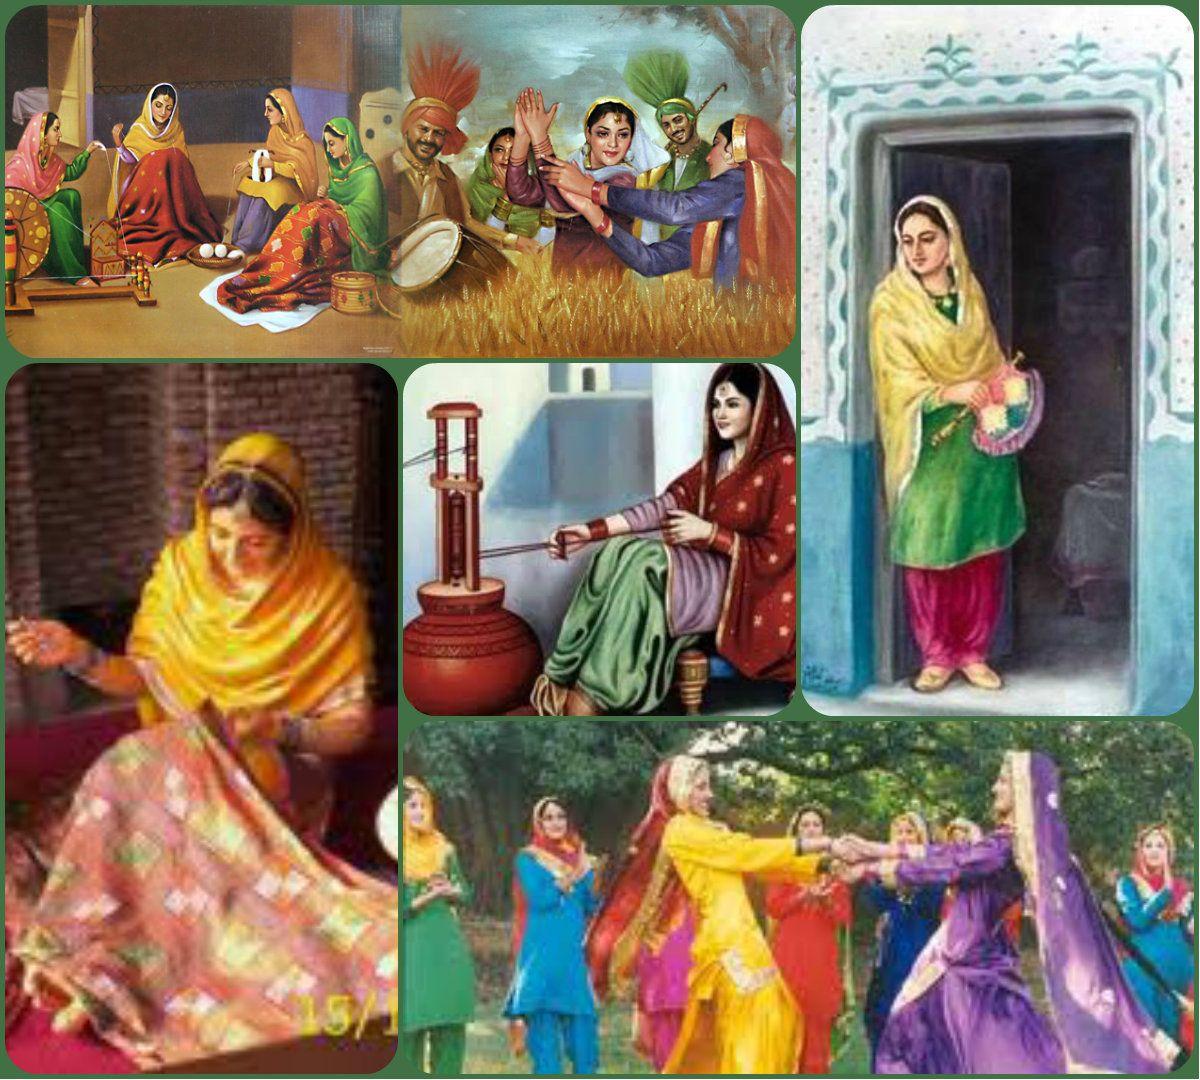 punjabi-sex-movie-collage